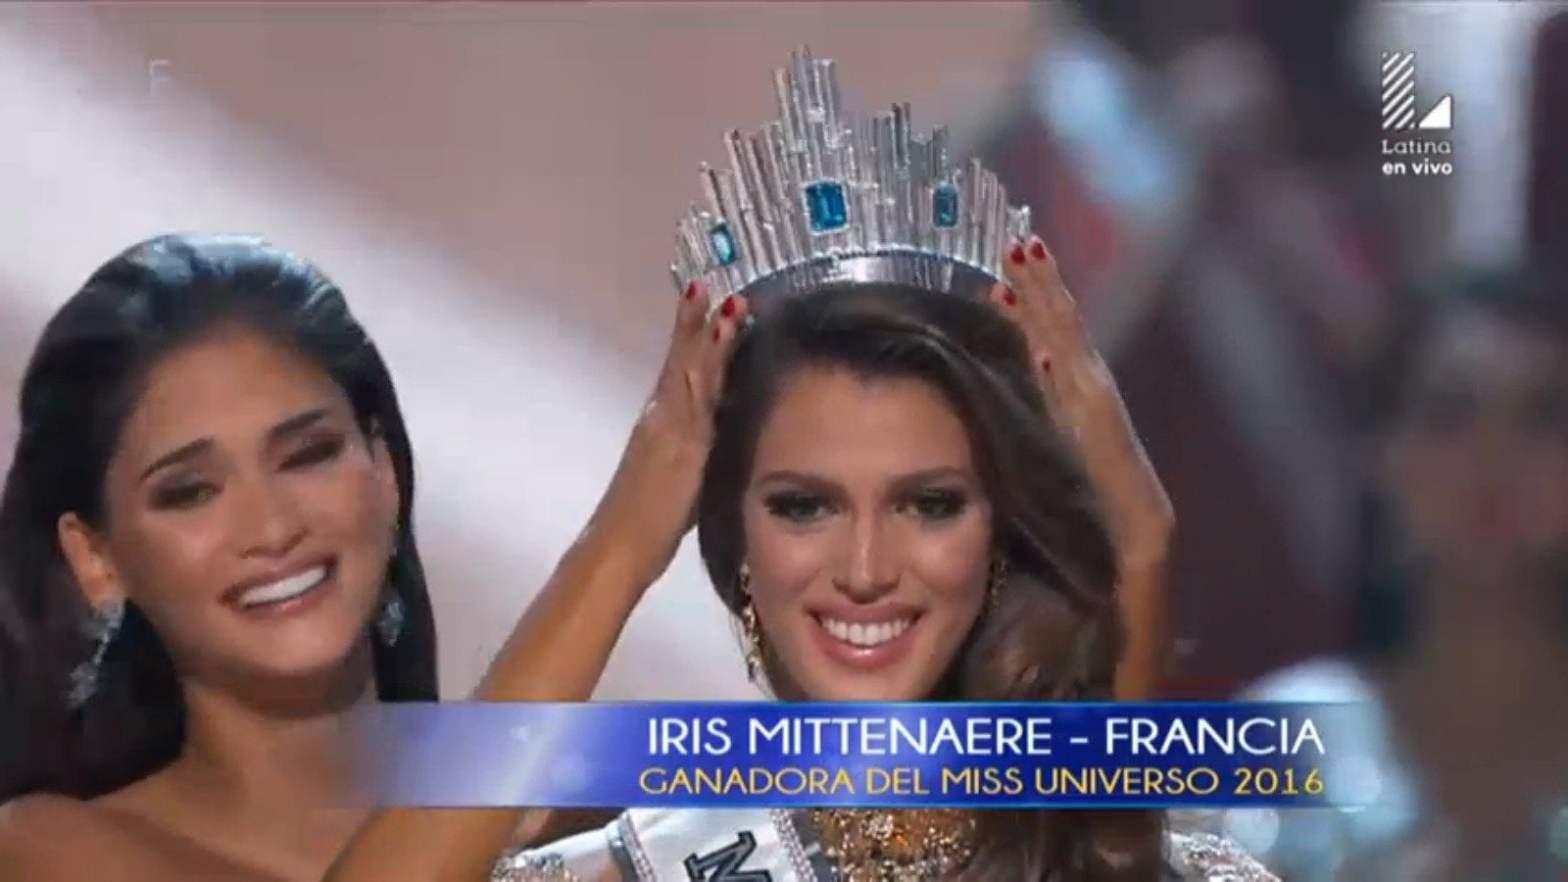 La nueva Miss Universo es Iris Mittenaere de Francia